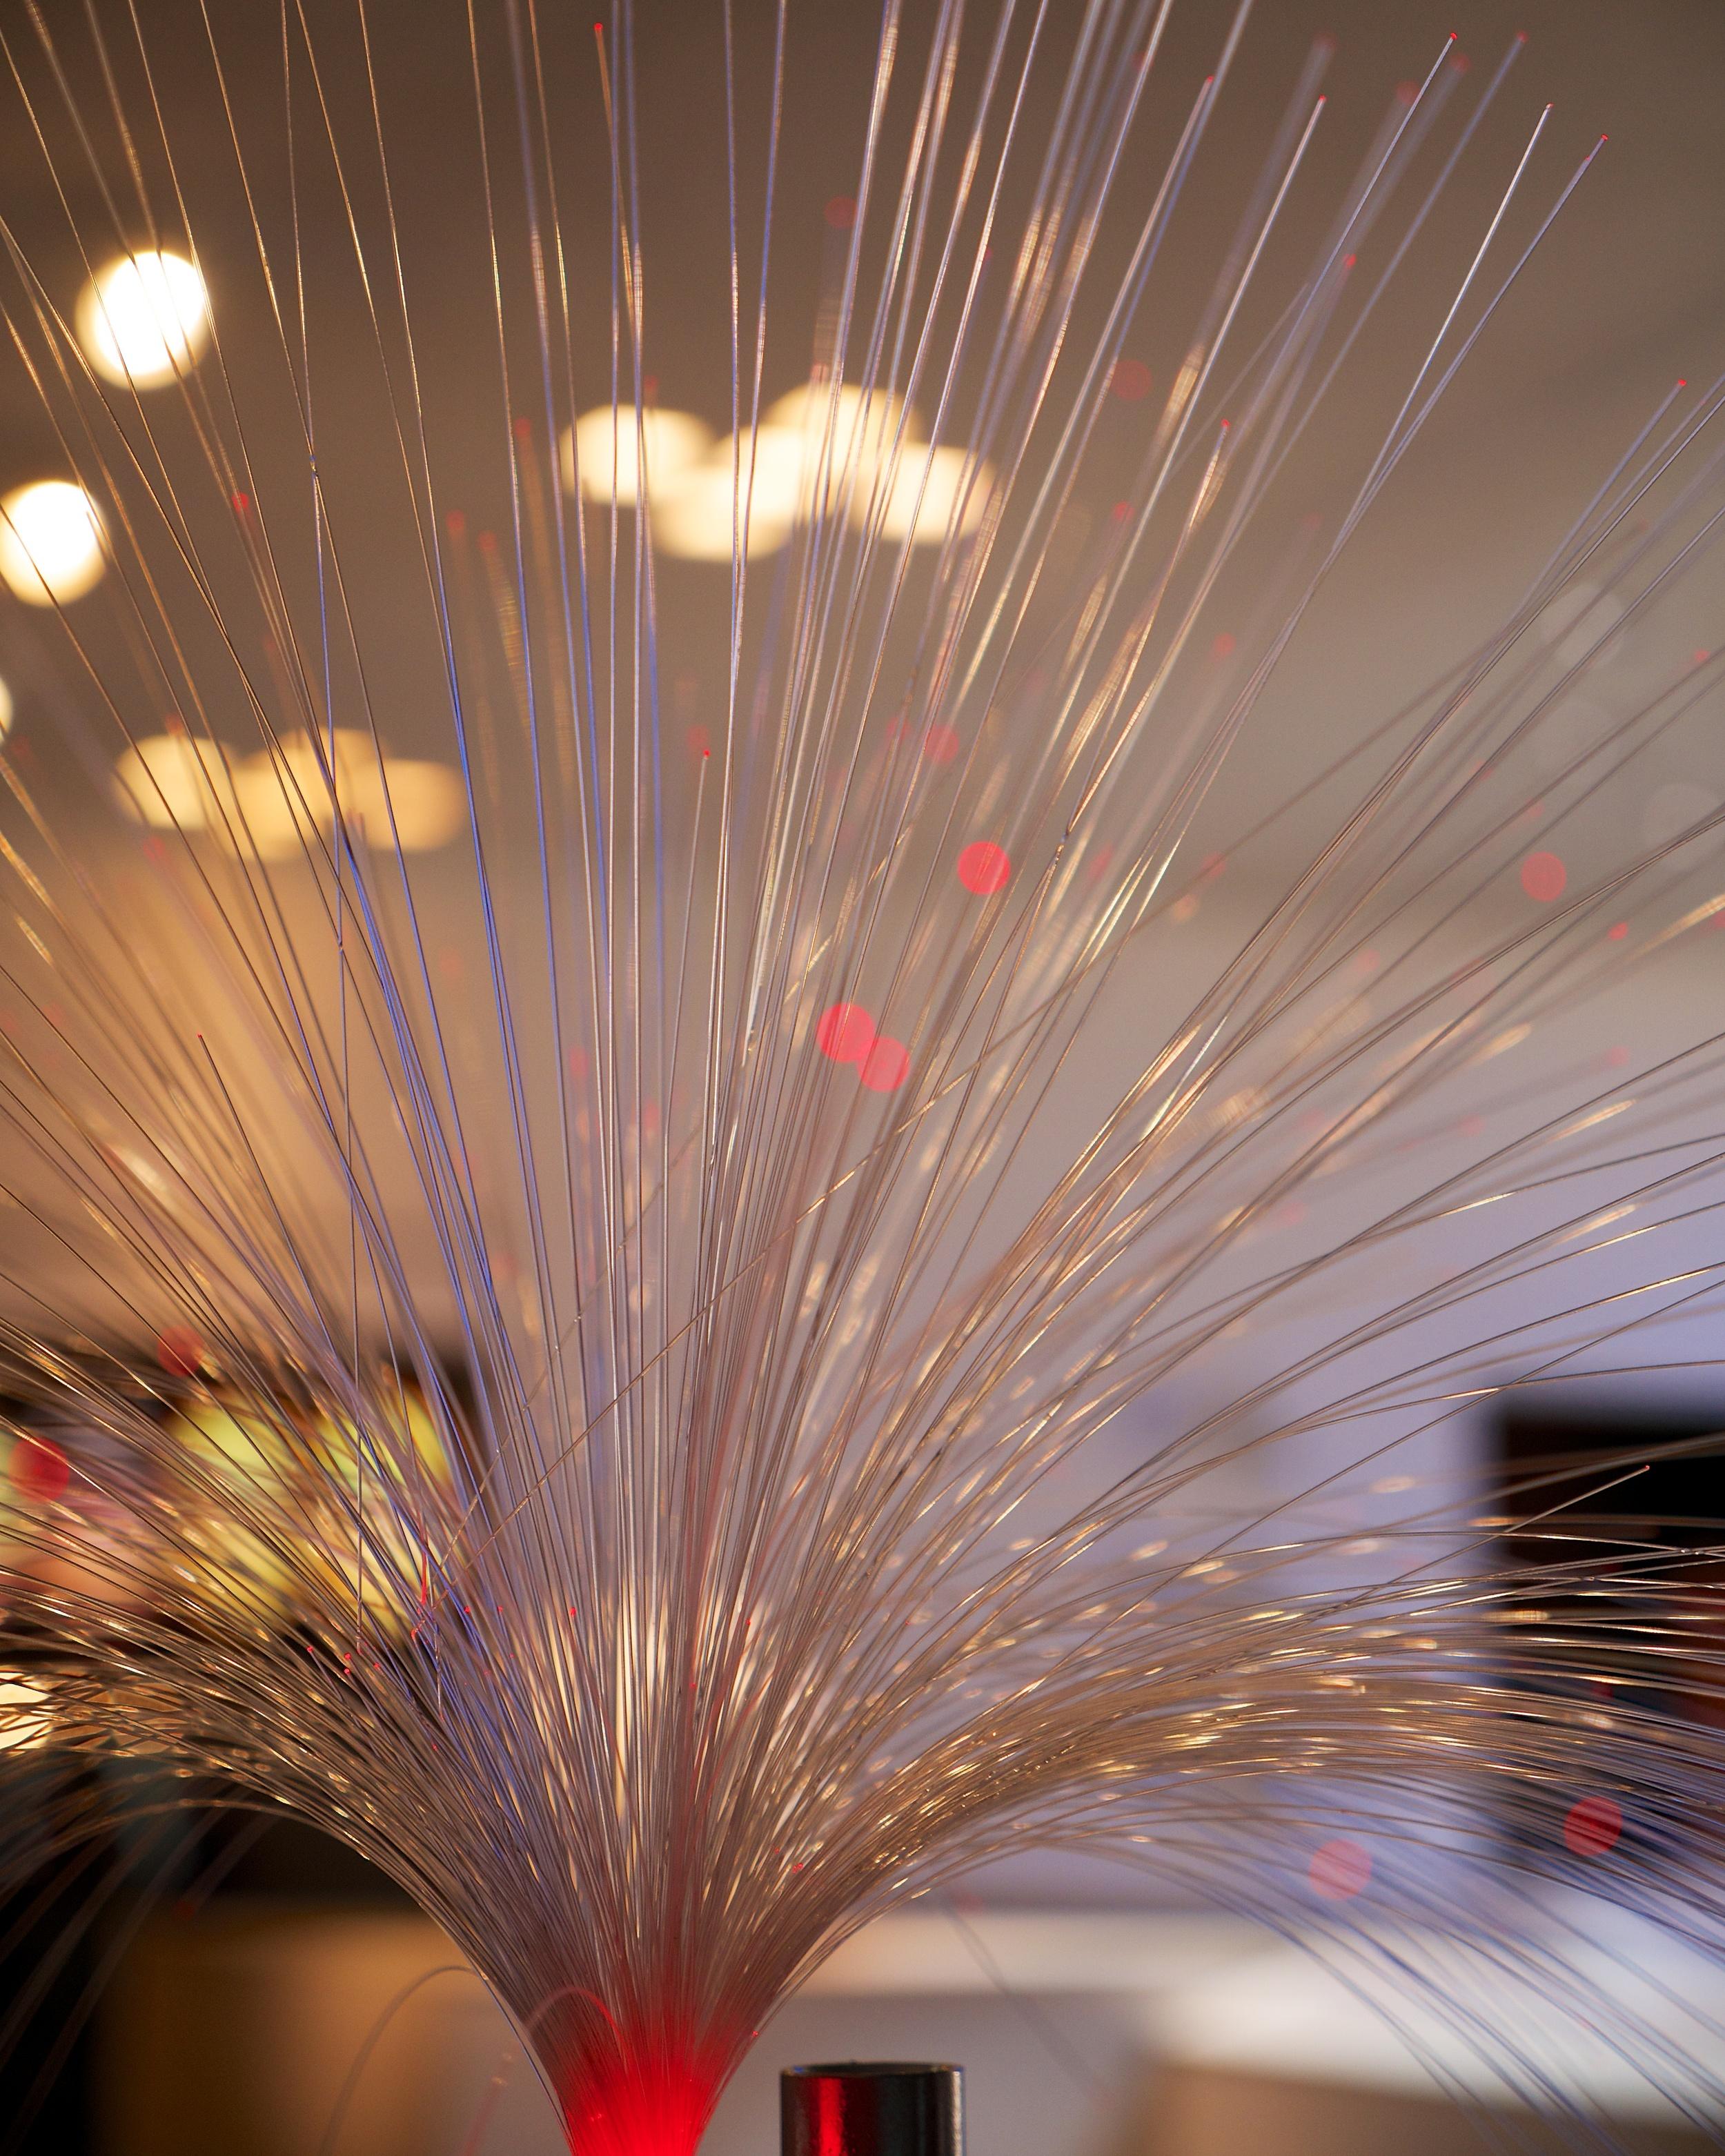 Fiber optic fibers making up a robot's hair